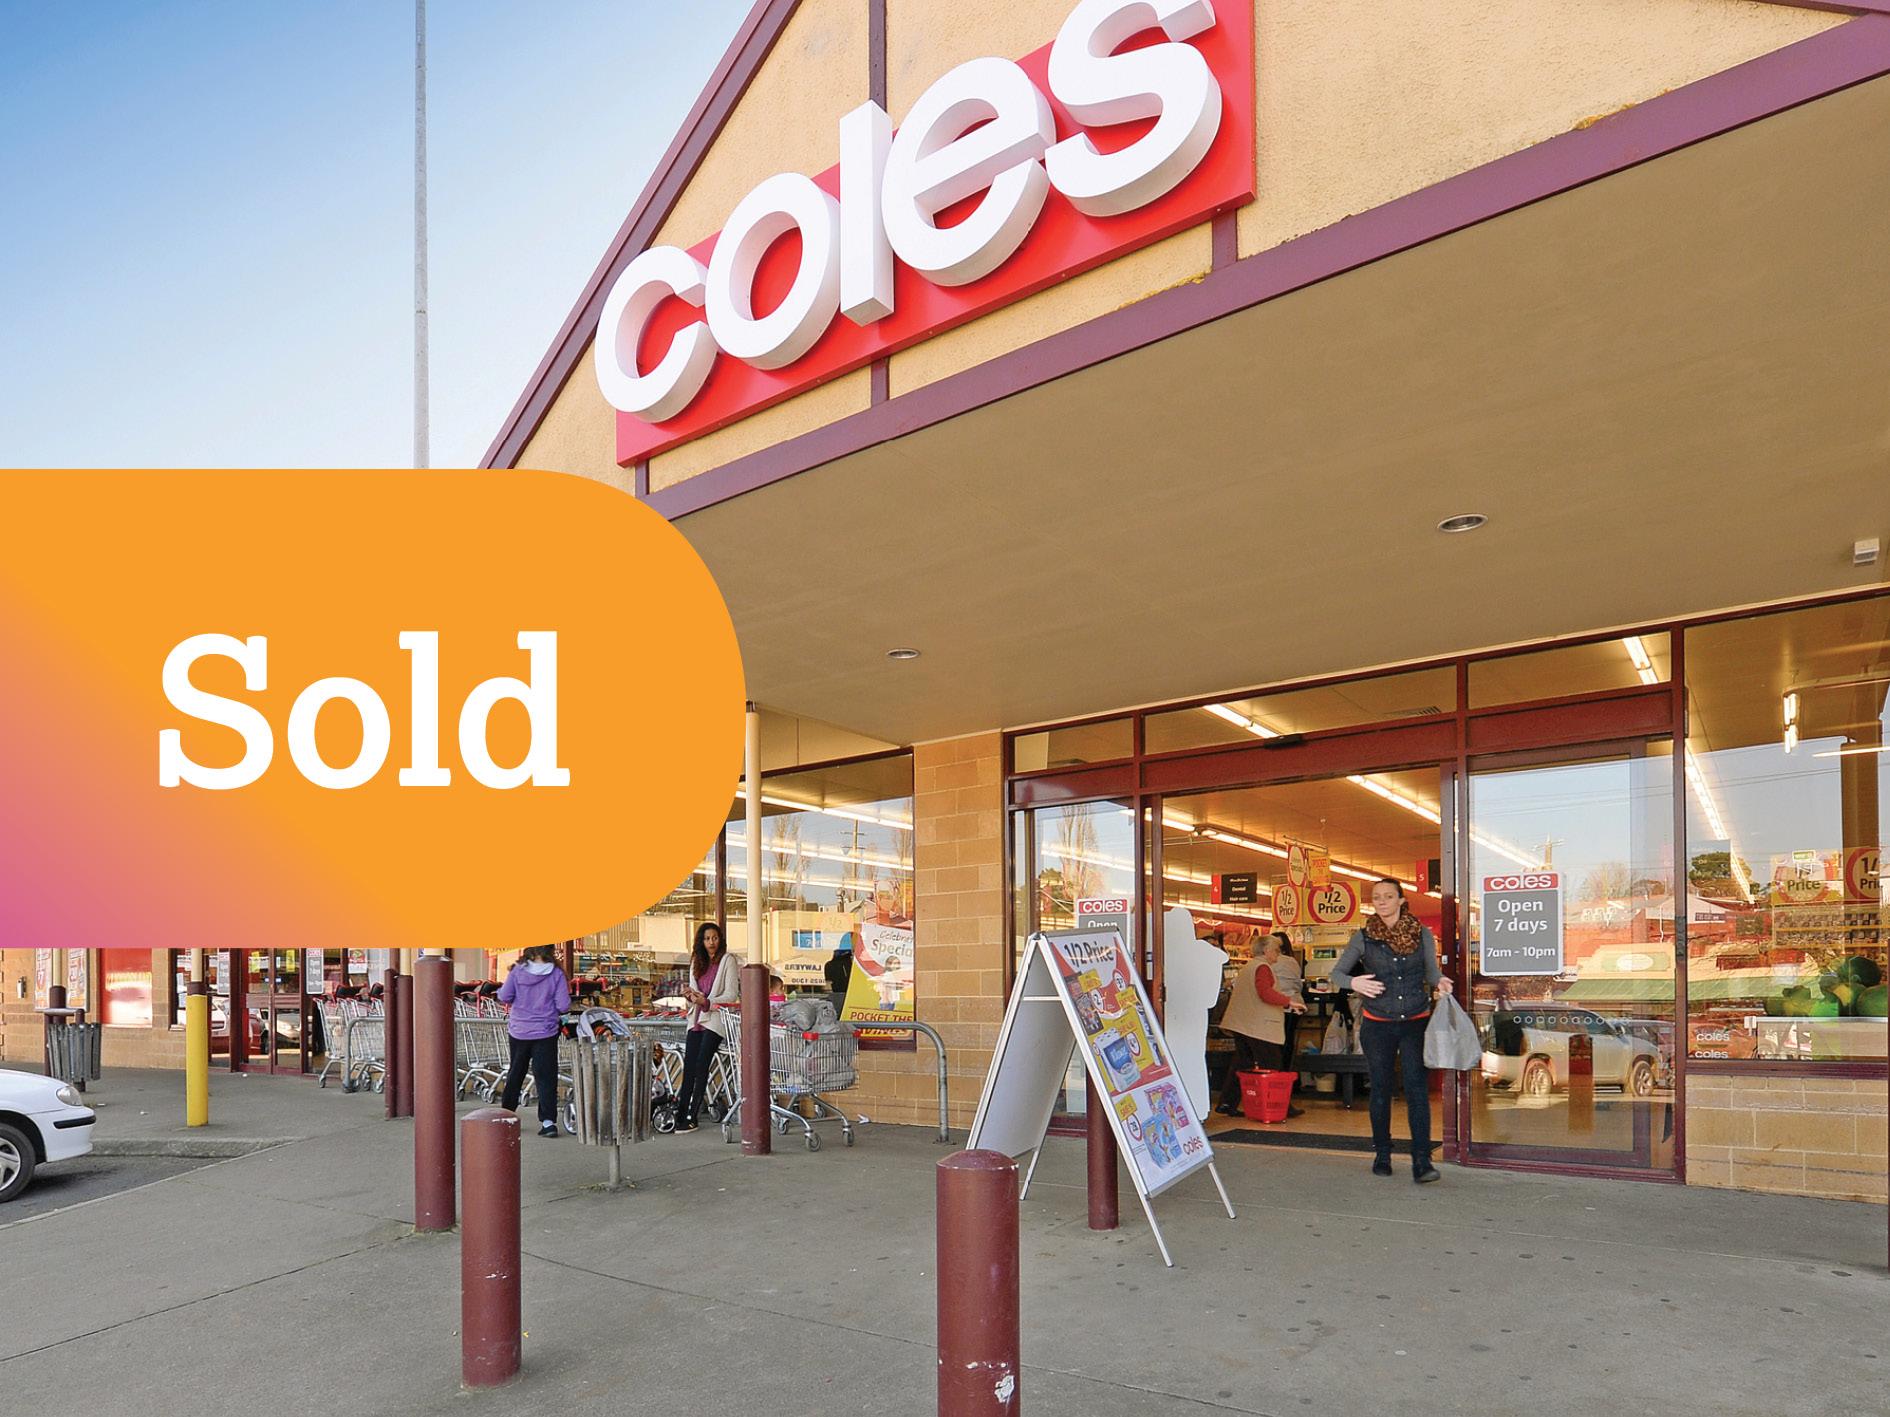 Successful Freestanding Coles Supermarket